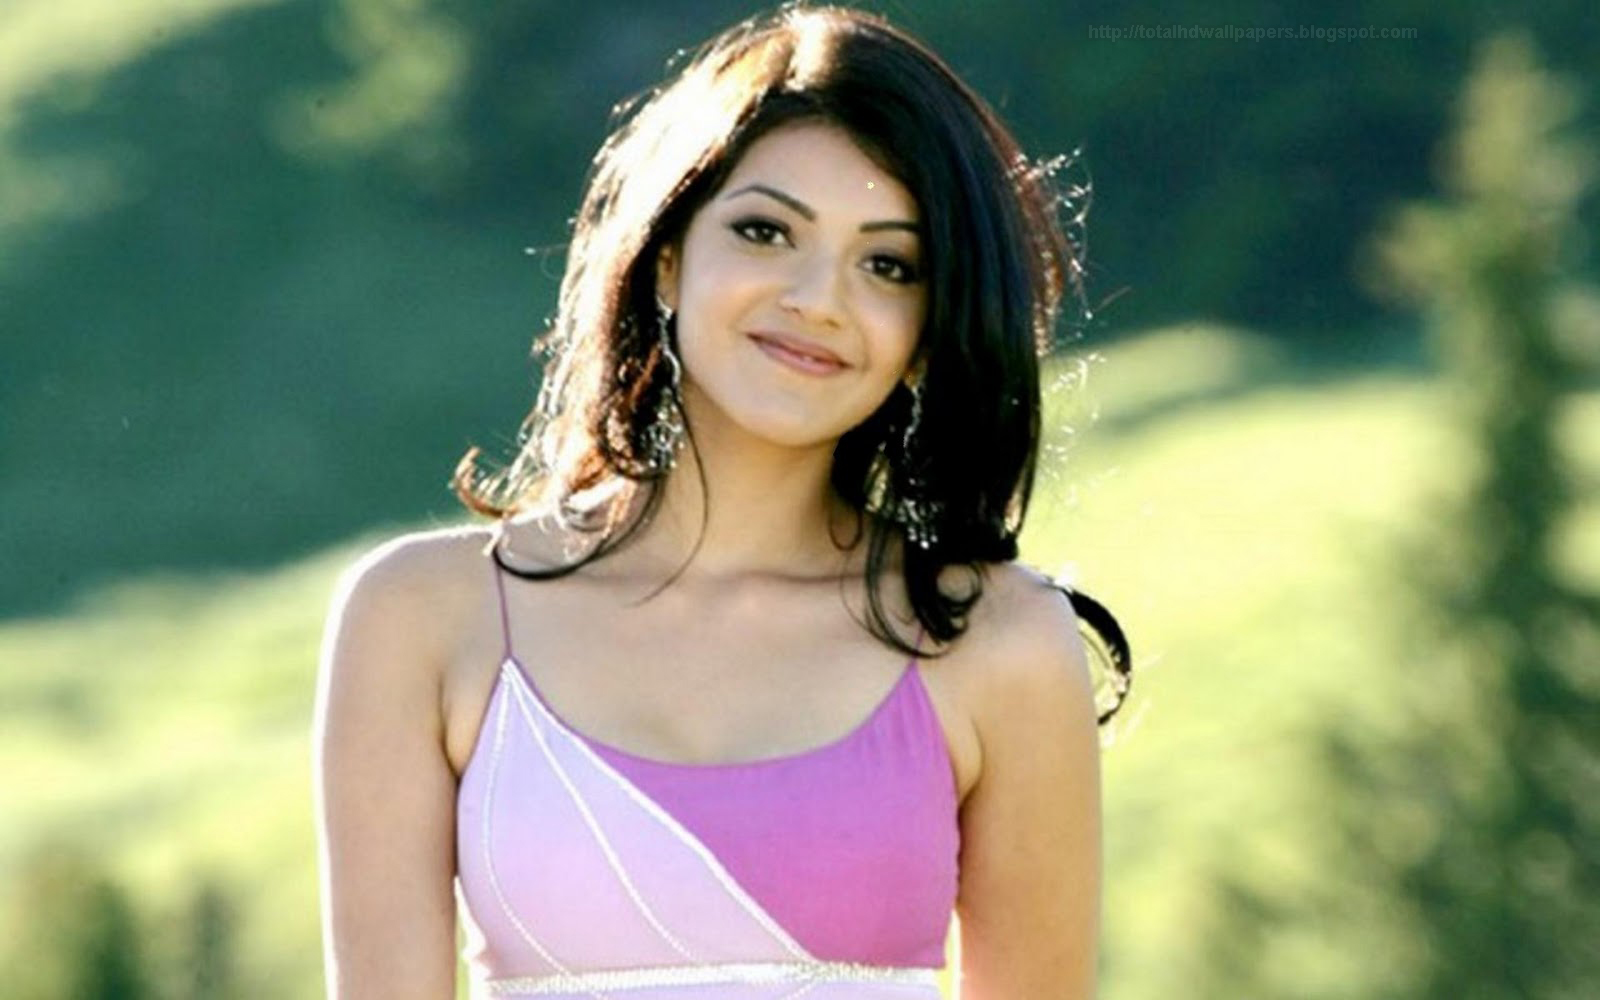 Full hd wallpapers bollywood actress wallpapersafari - Hollywood actress full hd wallpaper ...